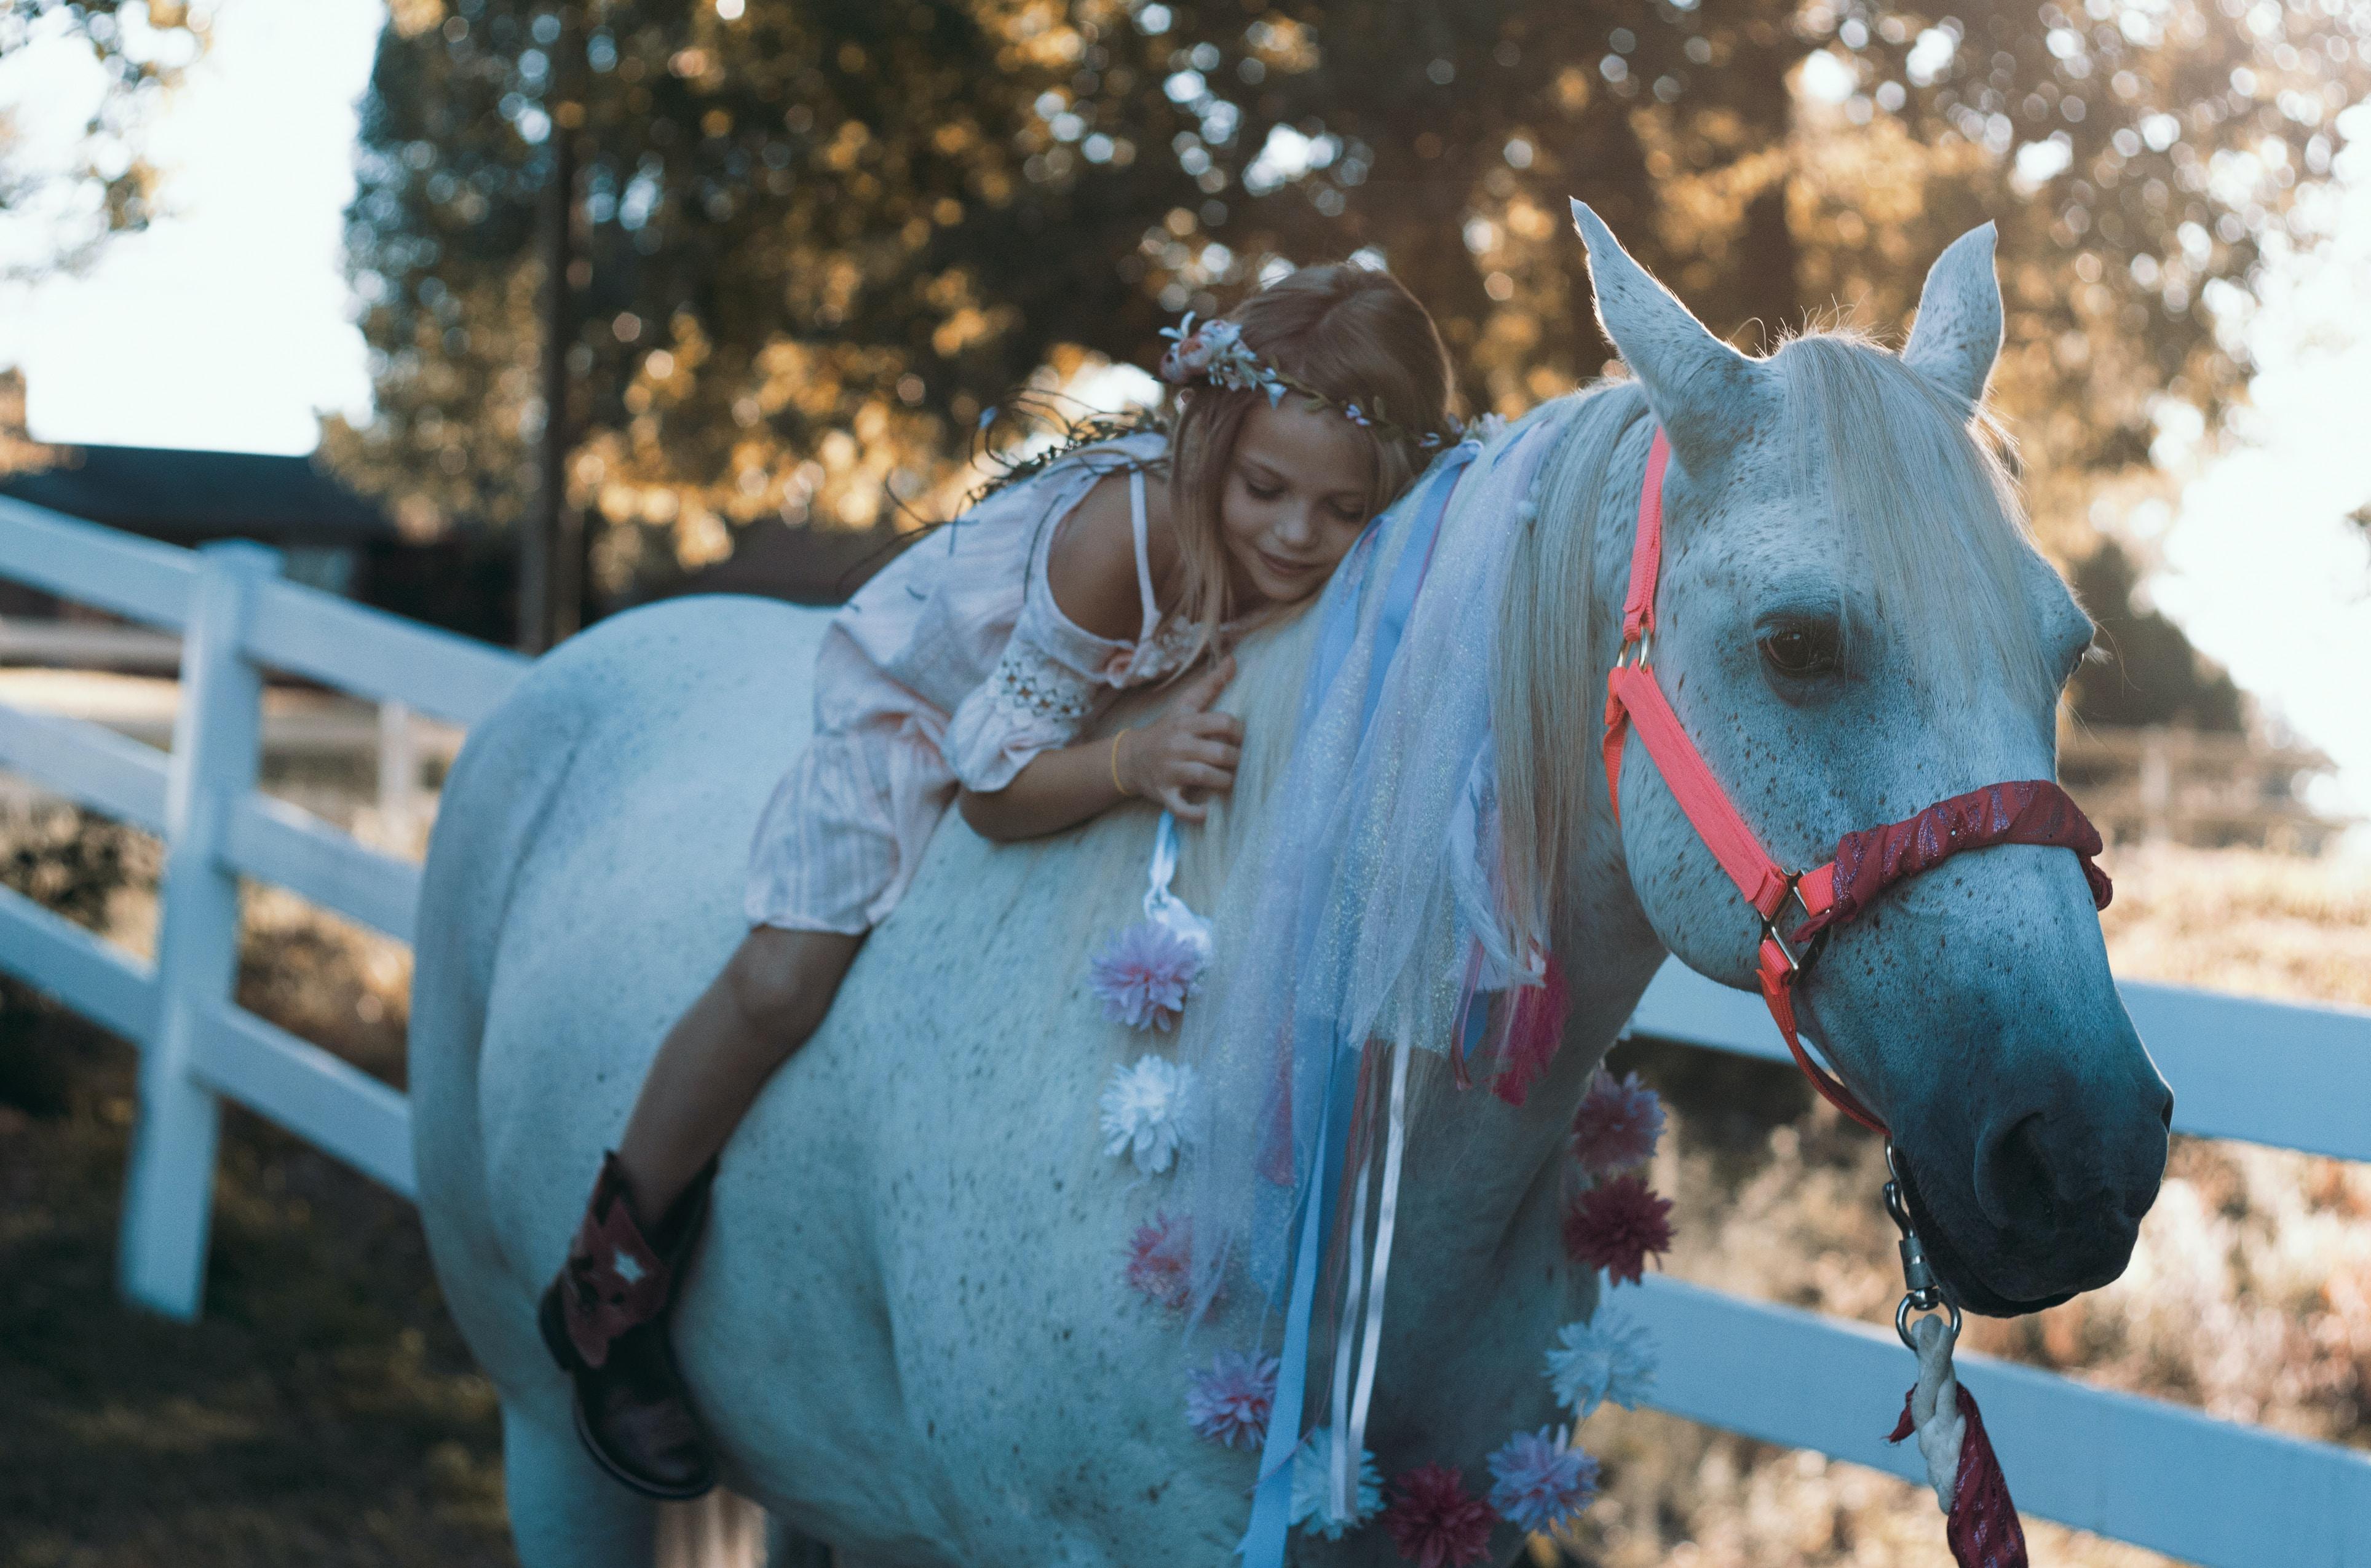 girl riding white horse during daytime